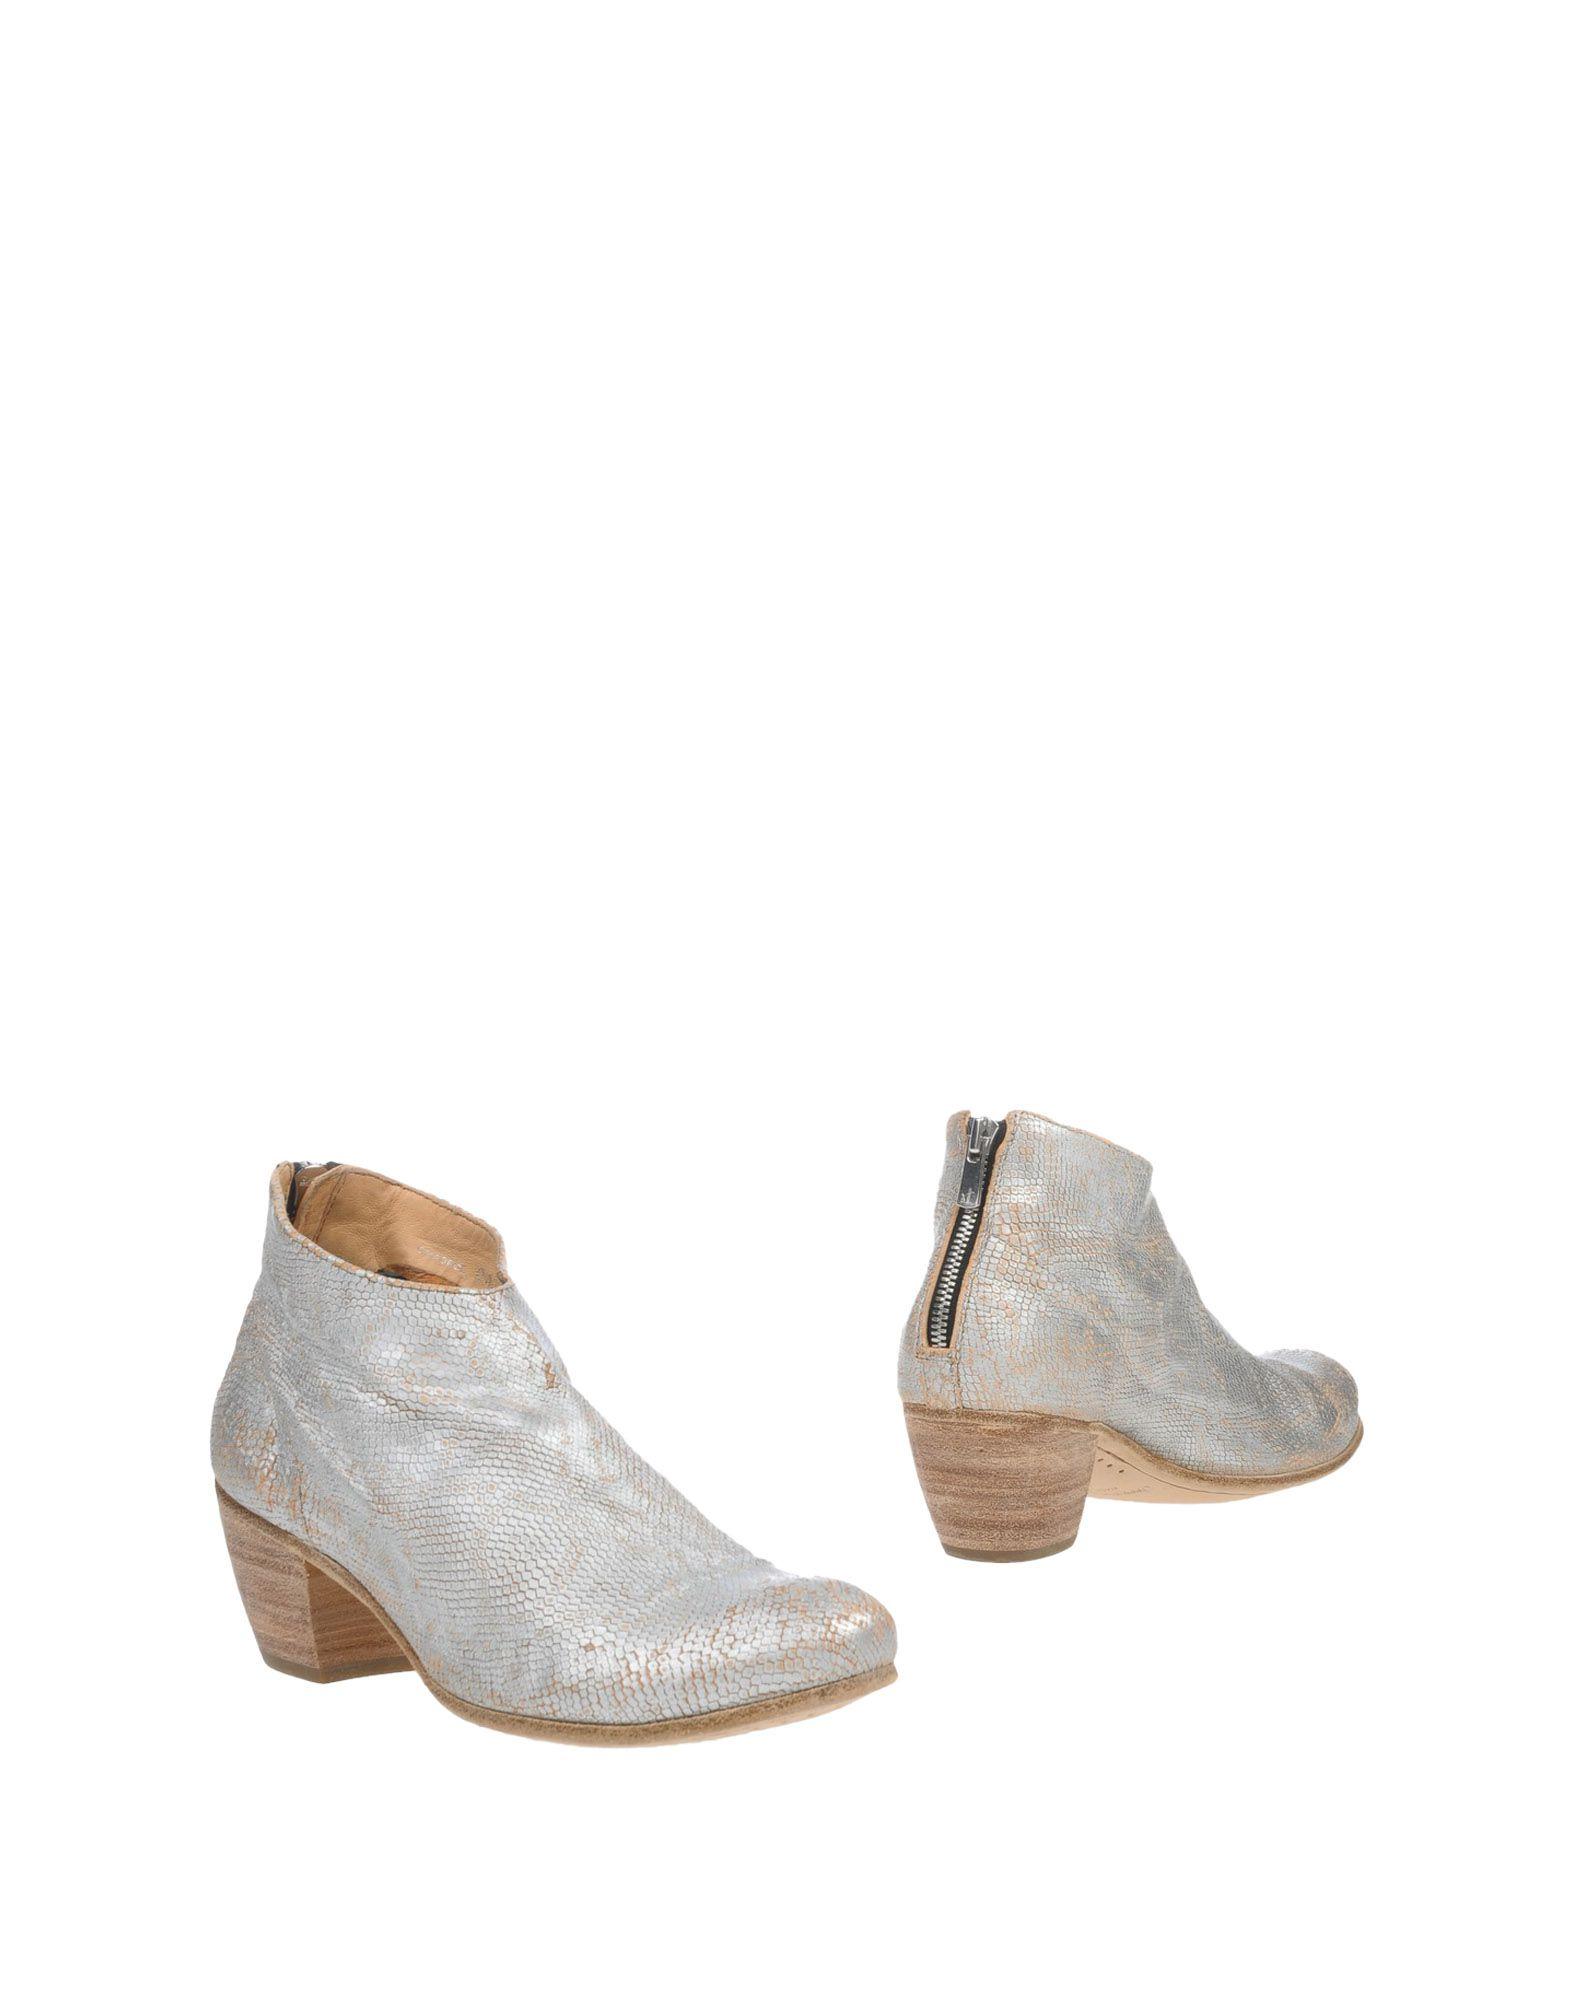 OFFICINE CREATIVE ITALIA Damen Ankle Boot Farbe Silber Größe 7